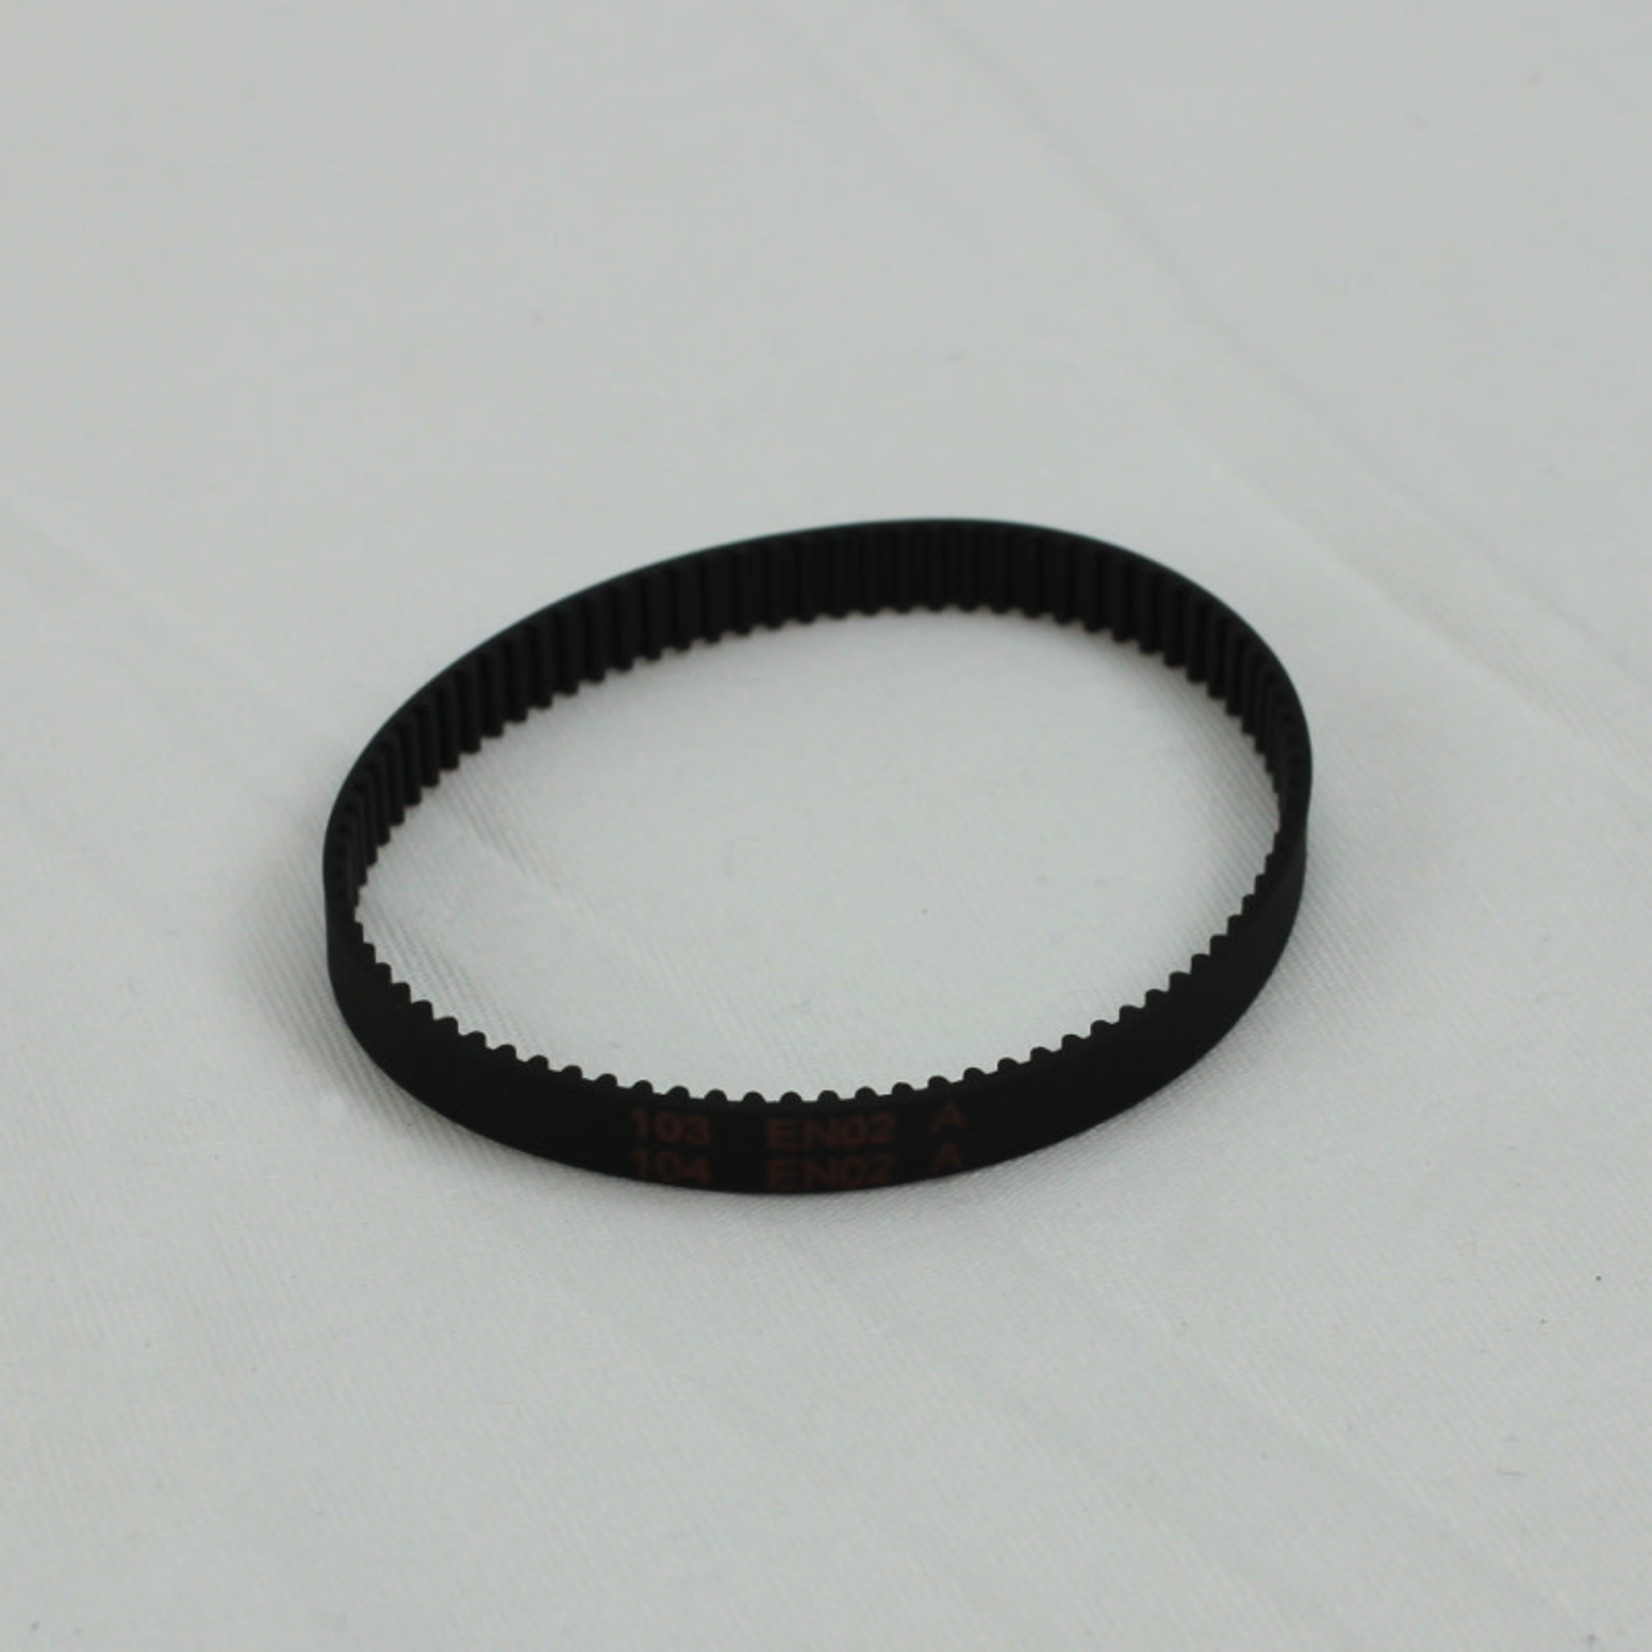 Dirt Devil Dirt Devil Geared Belt Fits UD70150